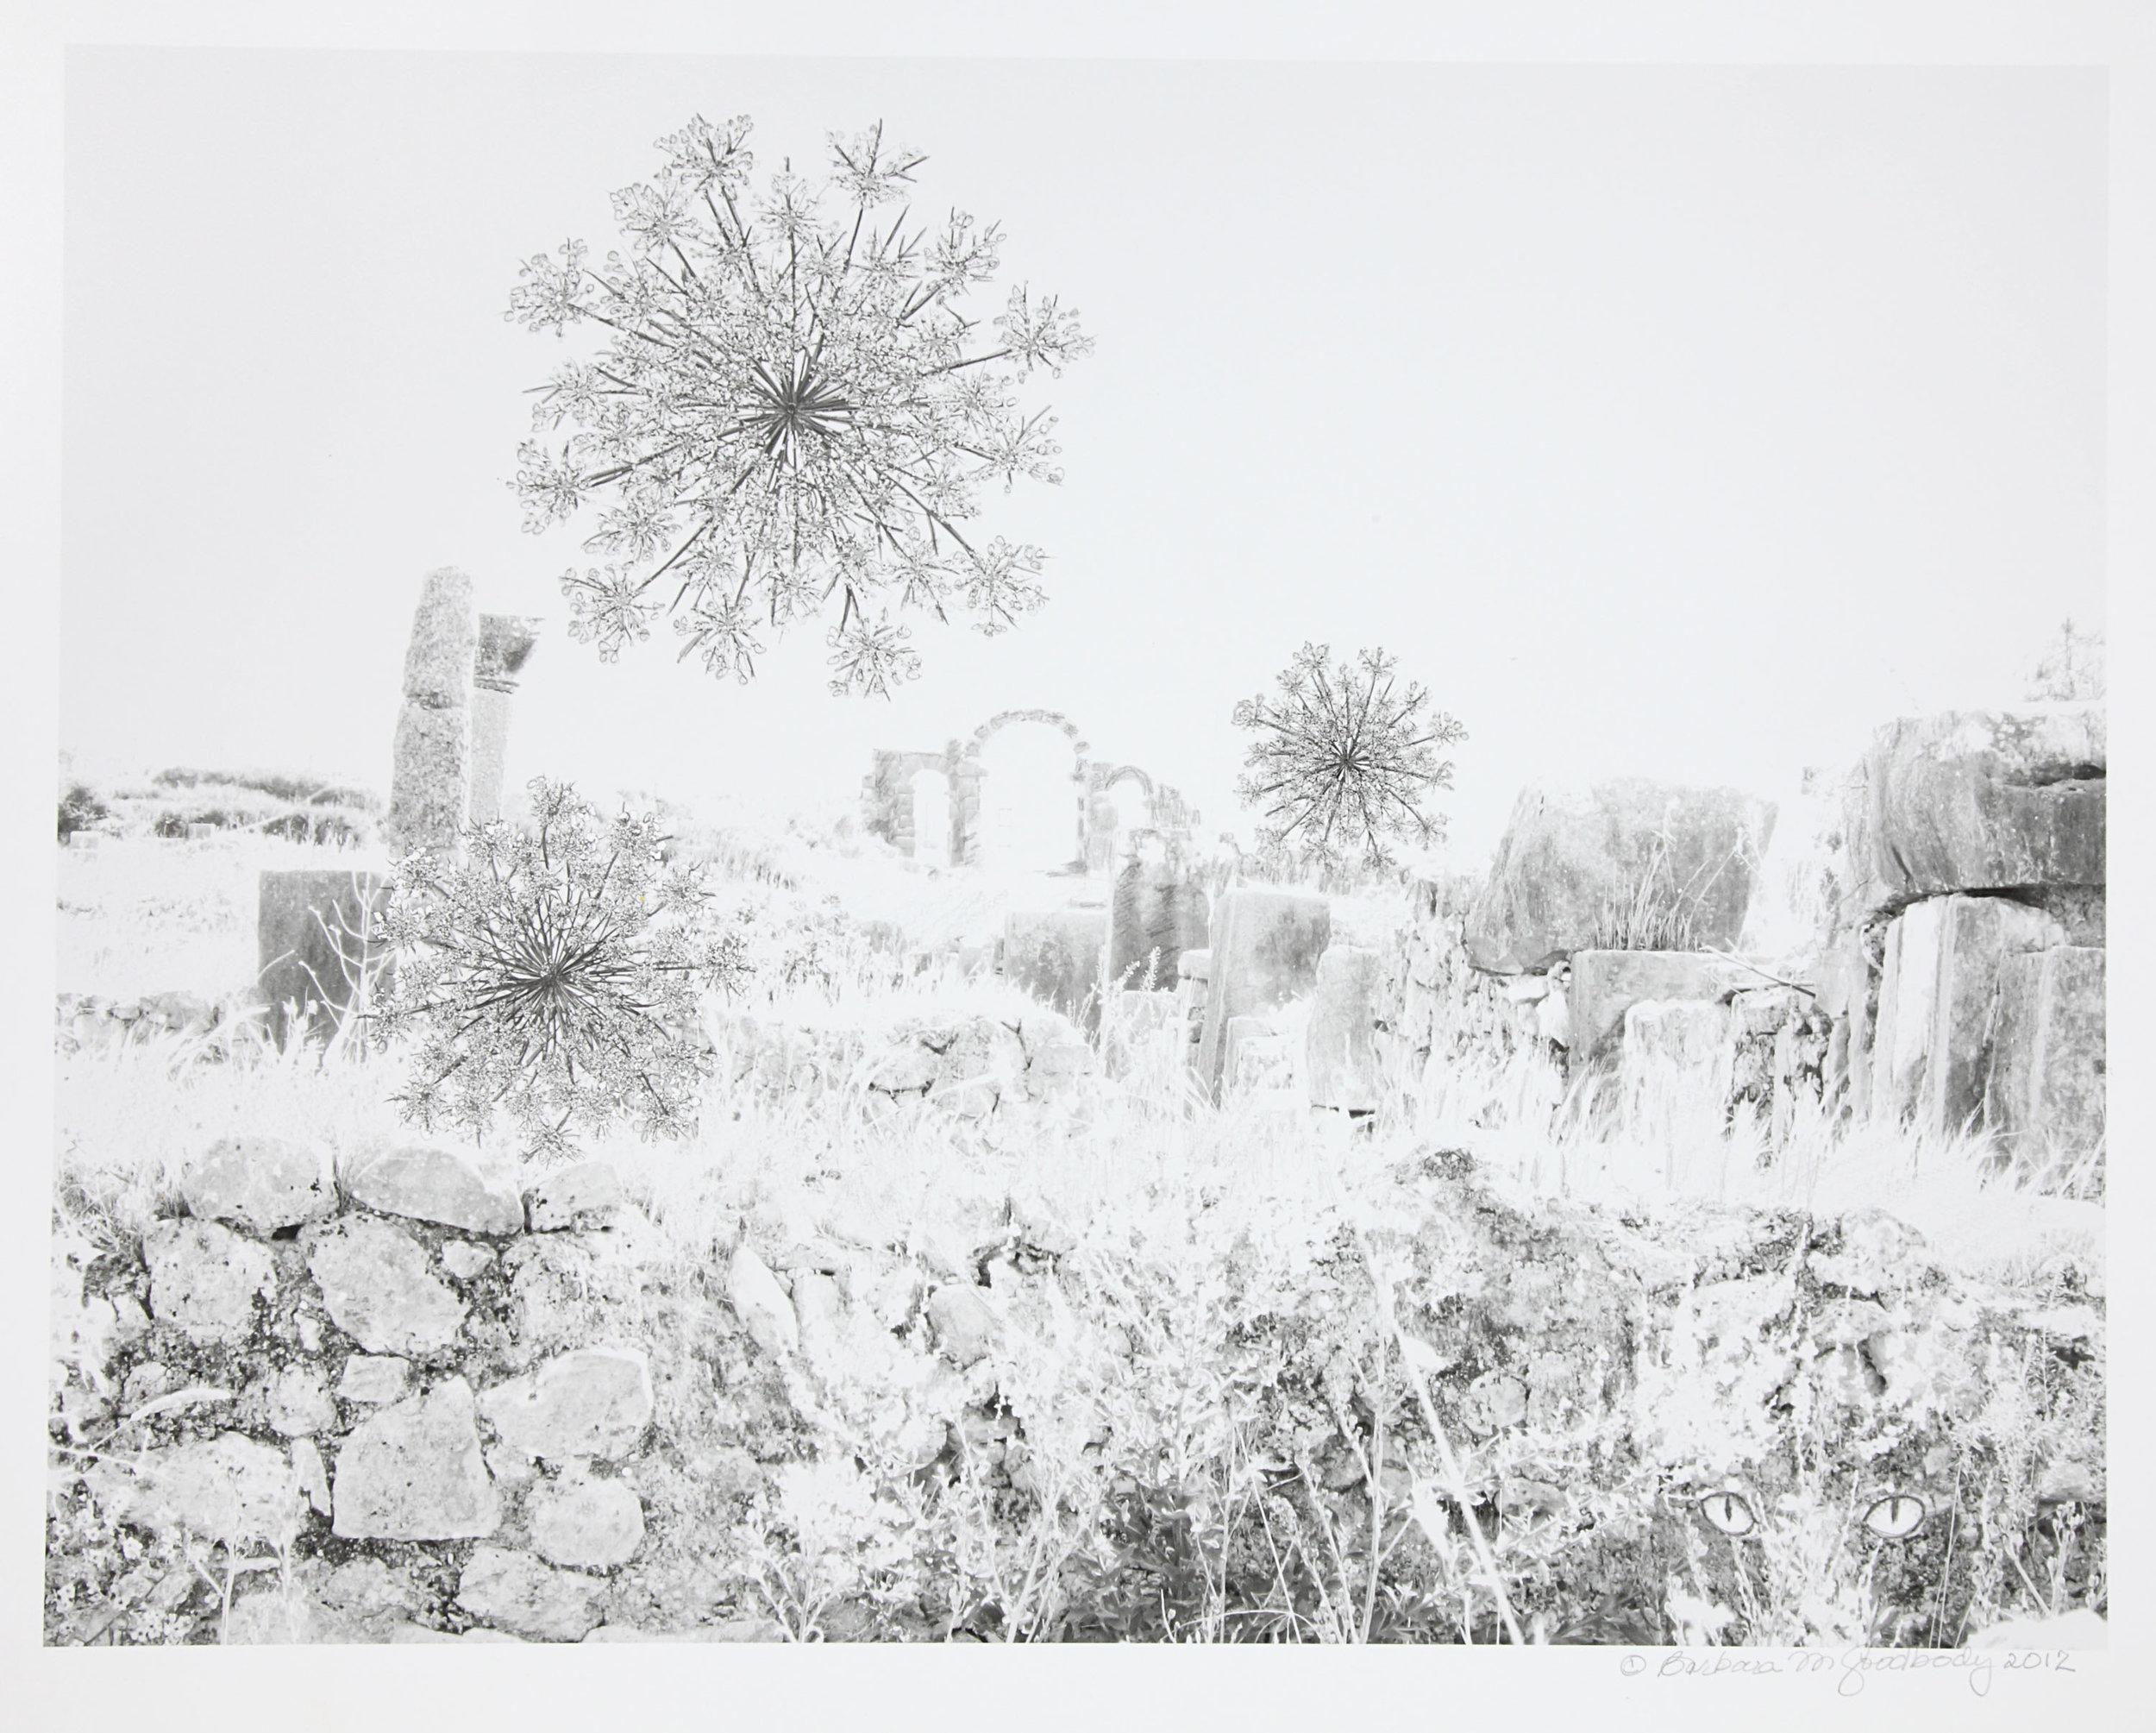 Barbara Goodbody,  Shared Memories  portfolio, 2012, 4/5, Ink jet print, 19.5 x 14 inches